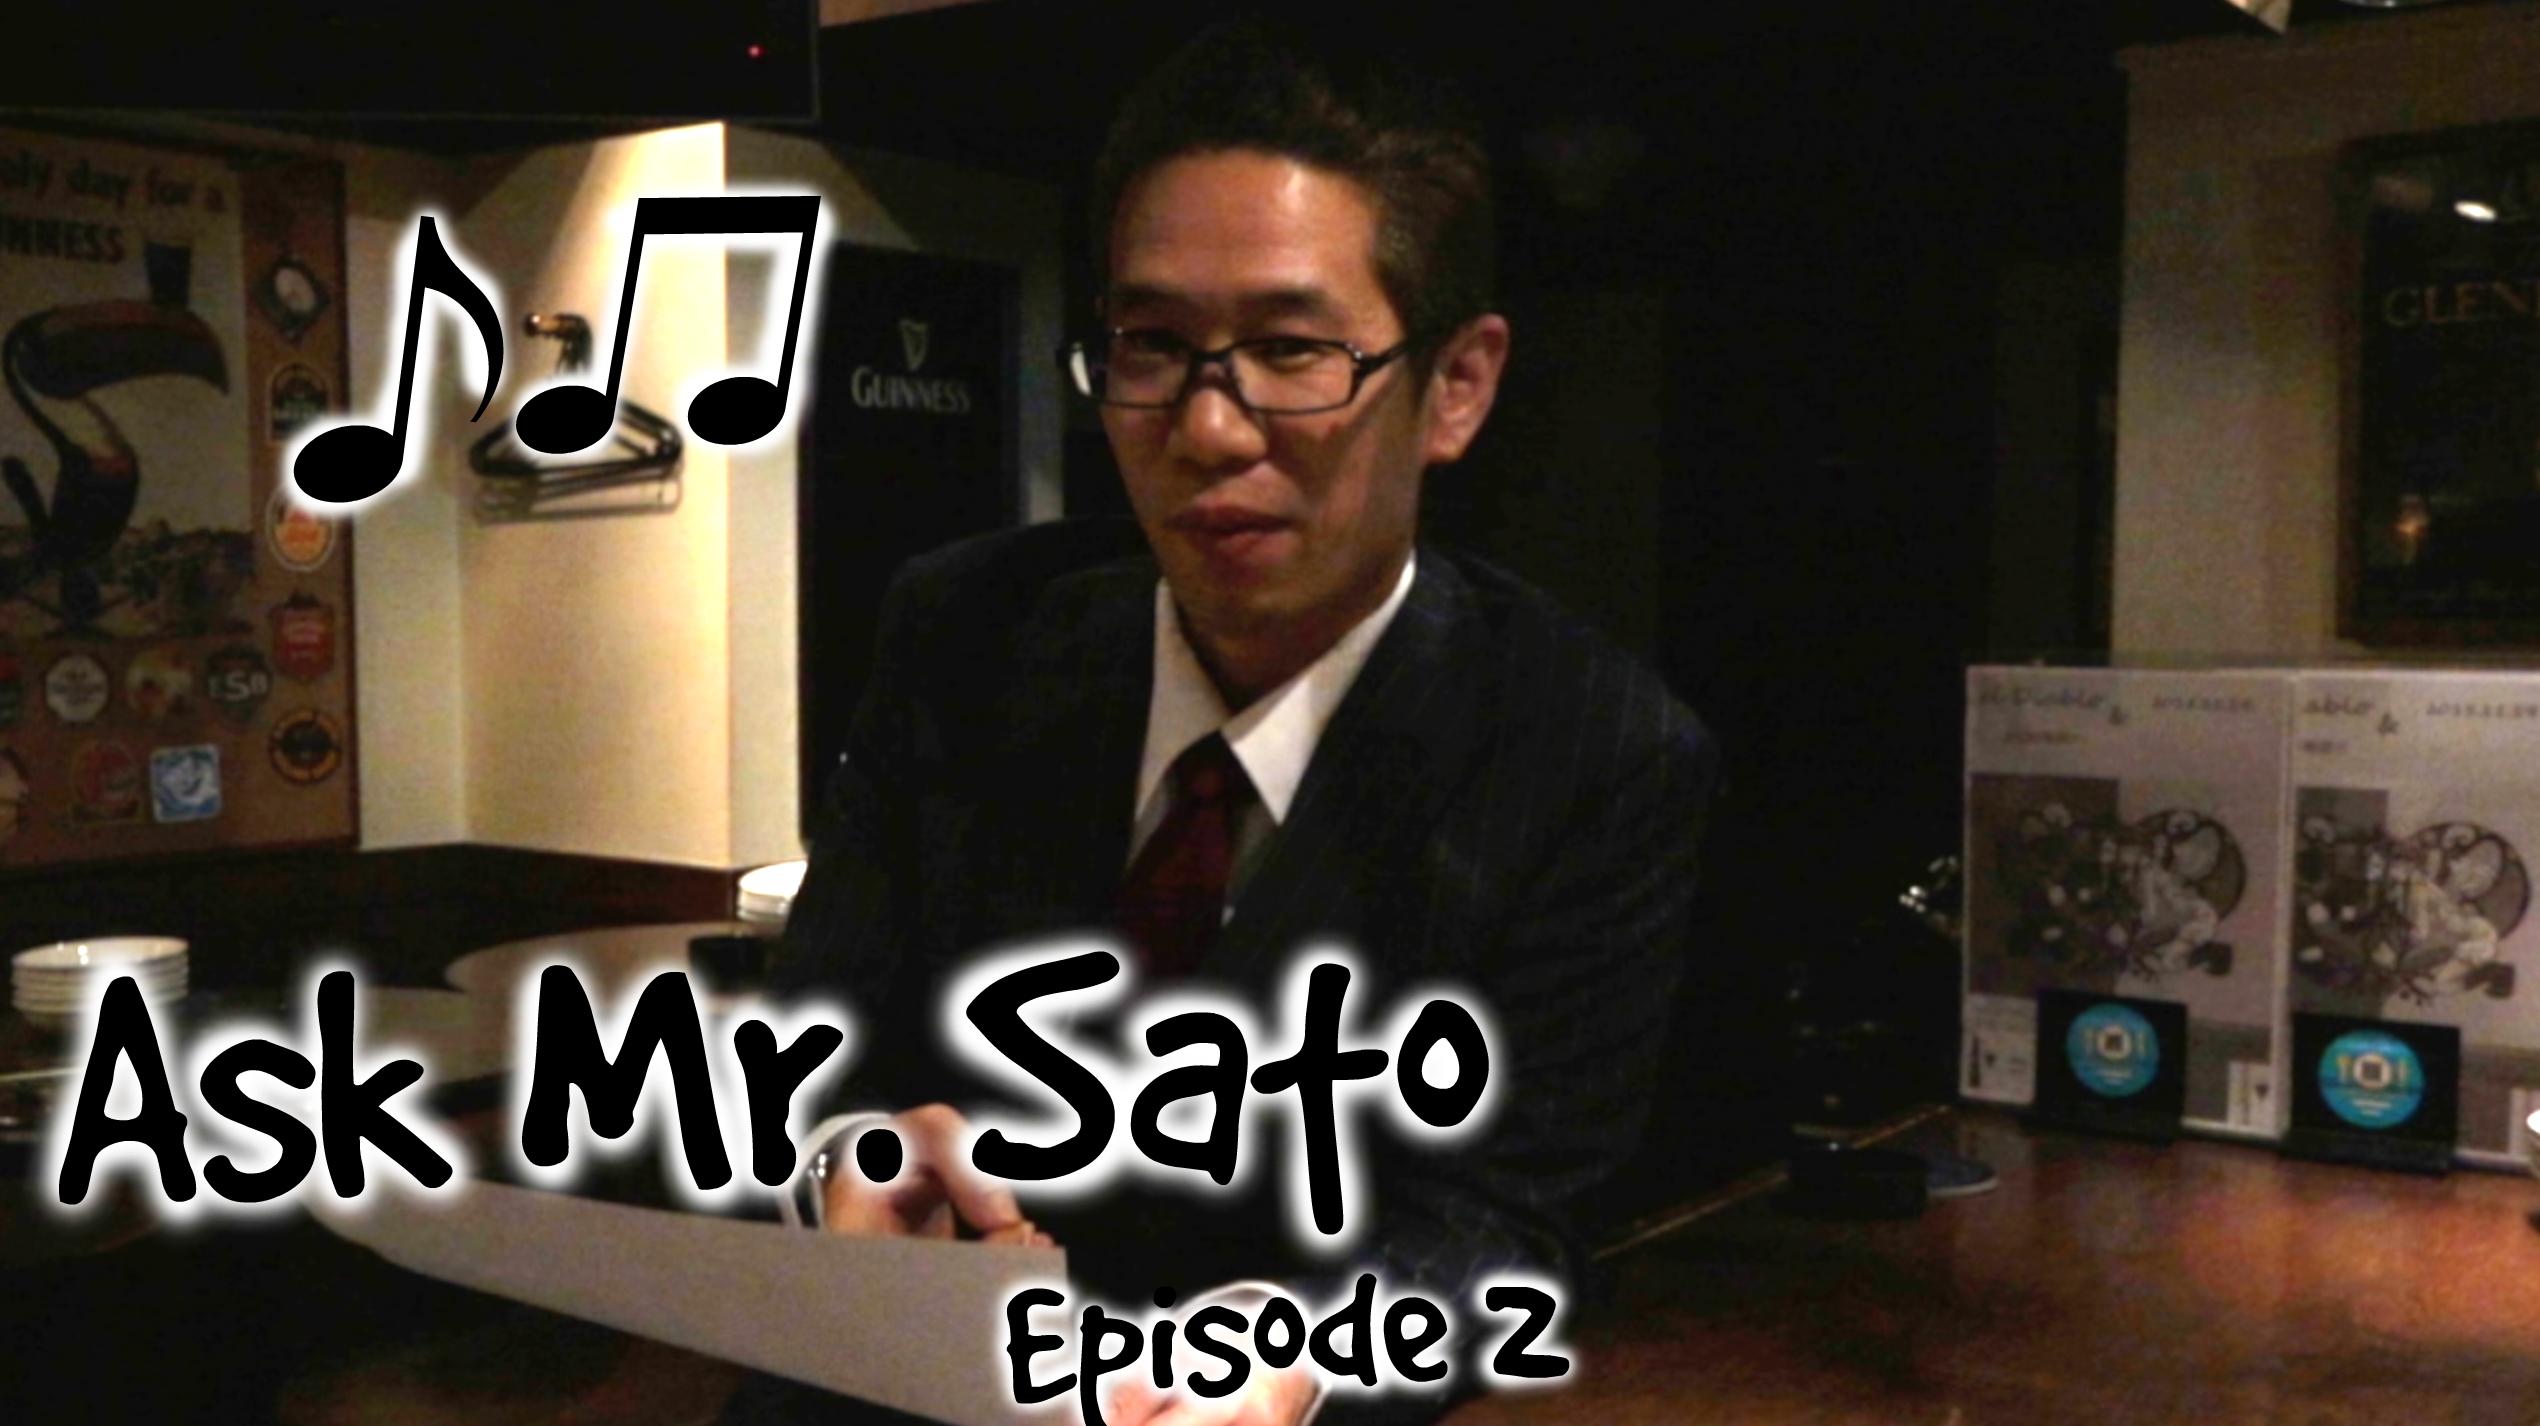 Ask Mr Sato Ep 2 Thumbnail